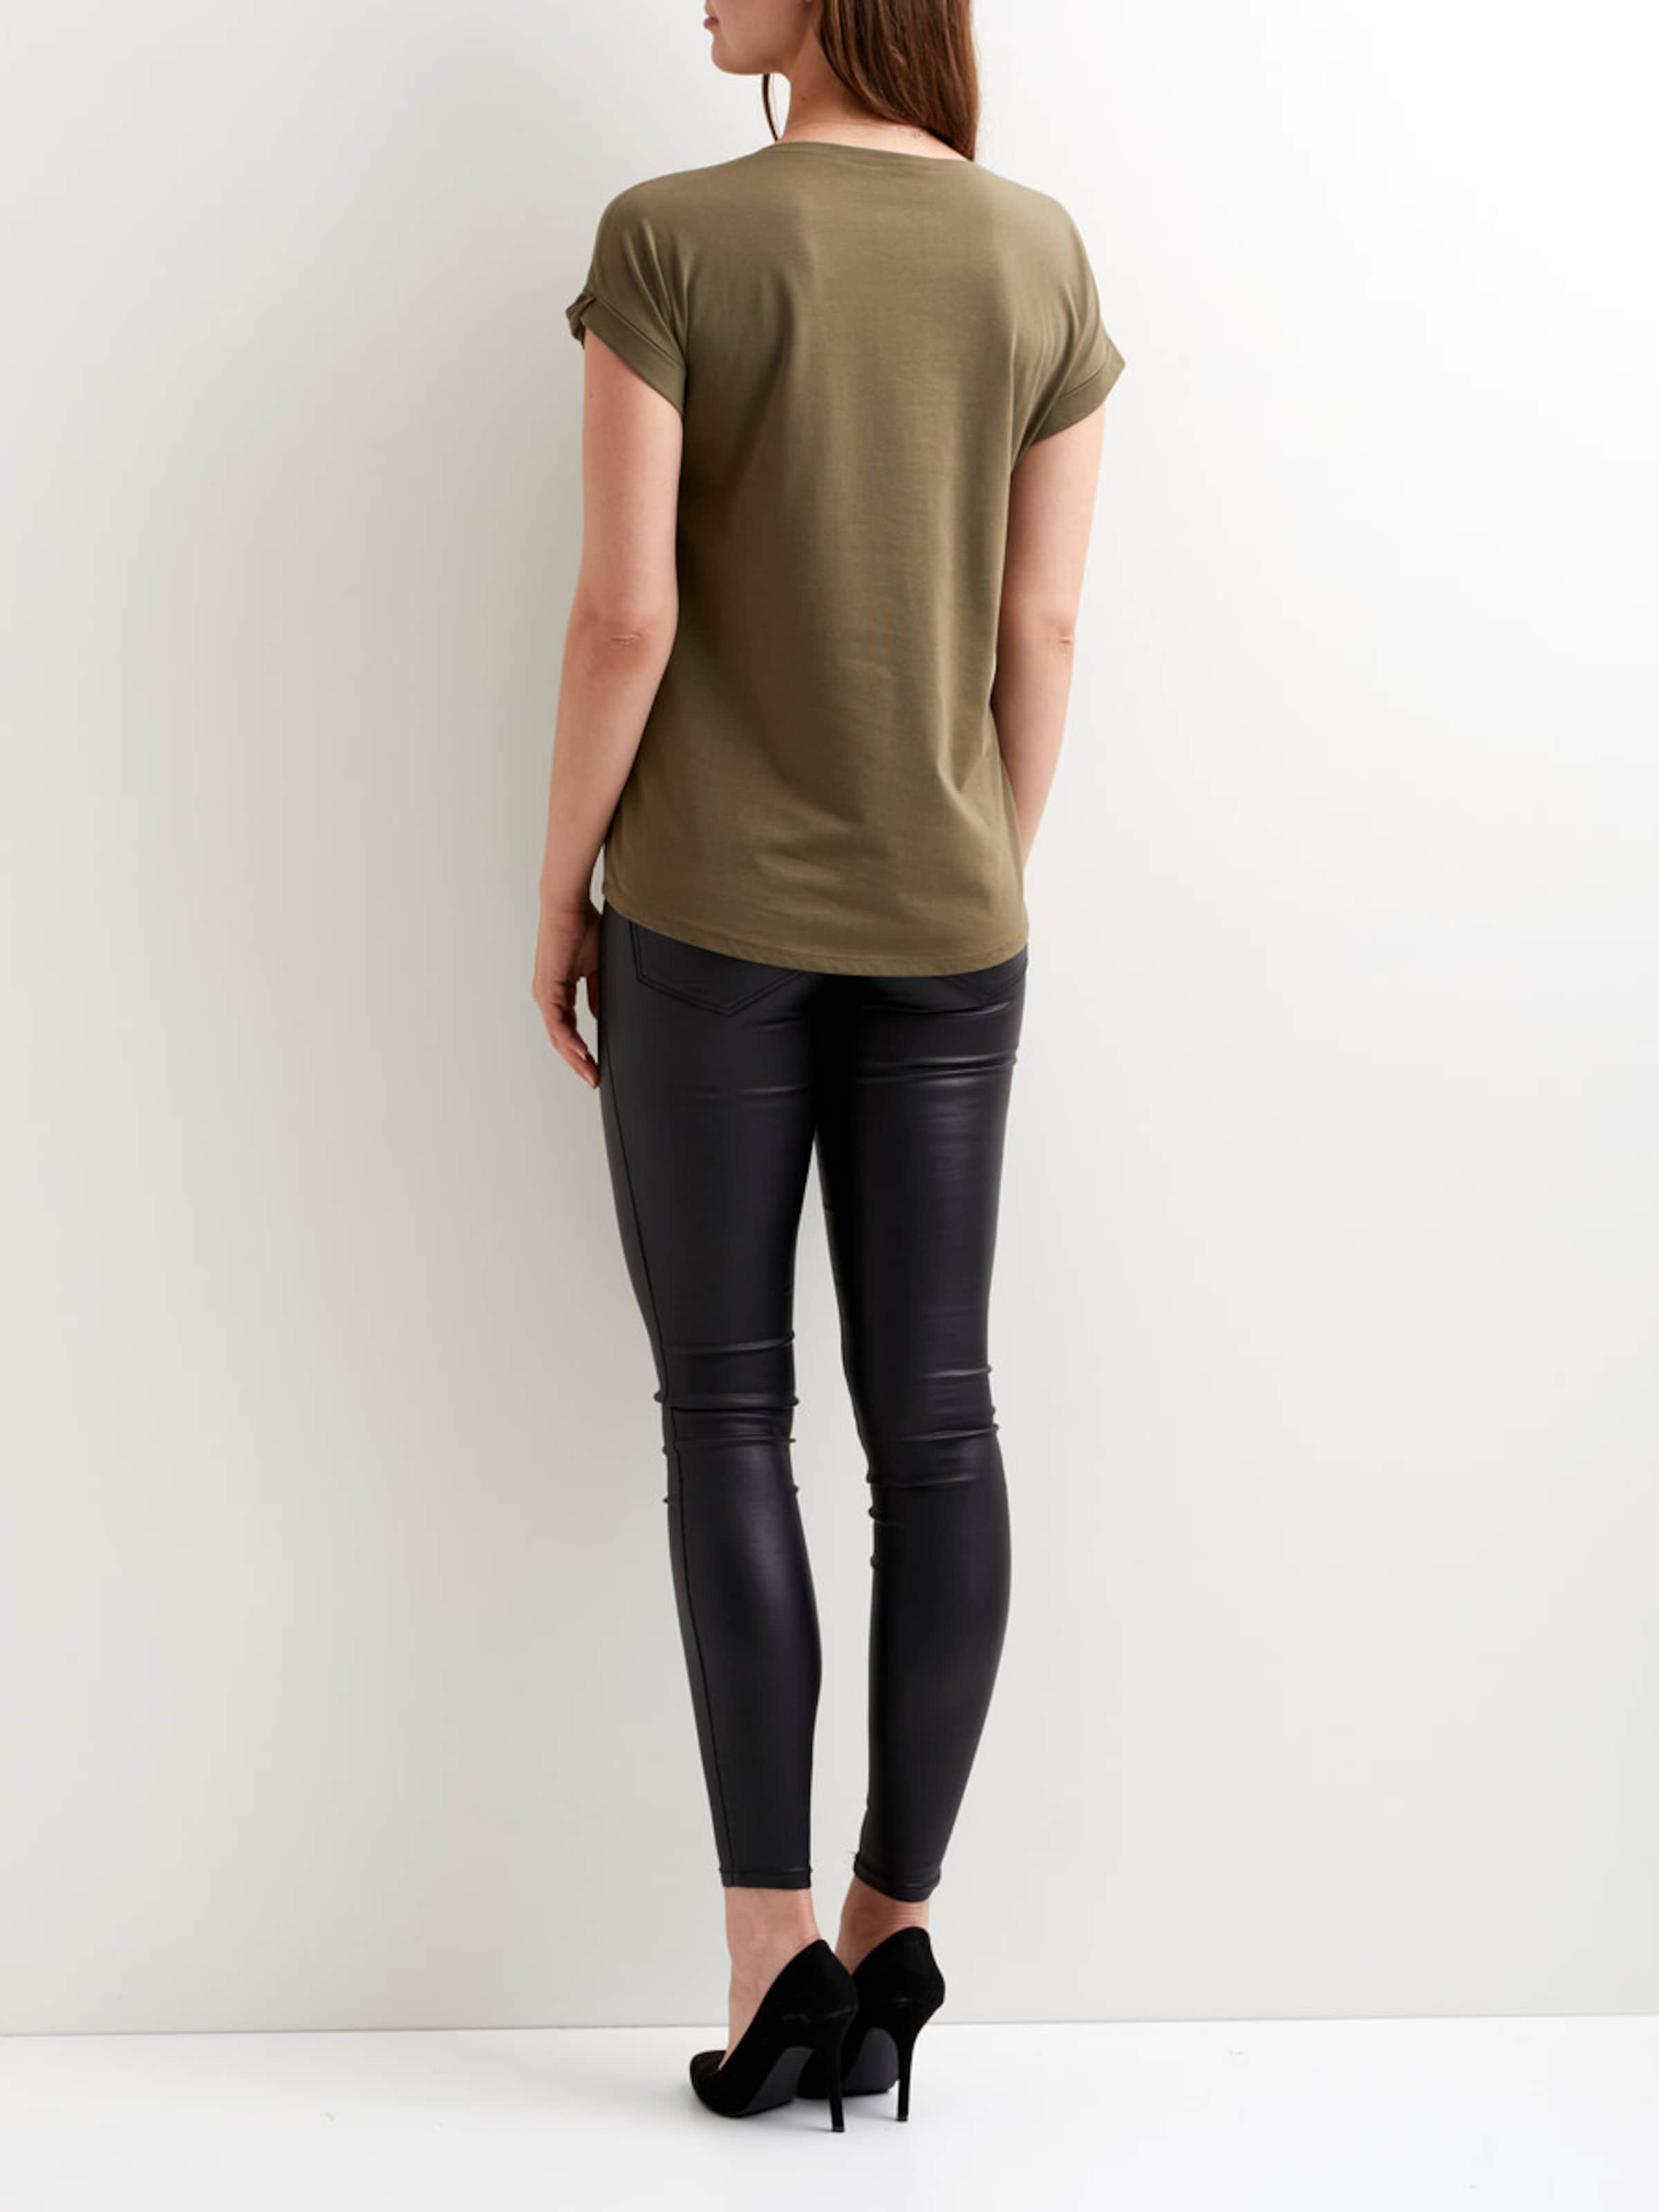 VILA Einfaches T-Shirt - 2-pack Neuesten Kollektionen Zu Verkaufen Gut Verkaufen Verkauf Online o02i3Glrz